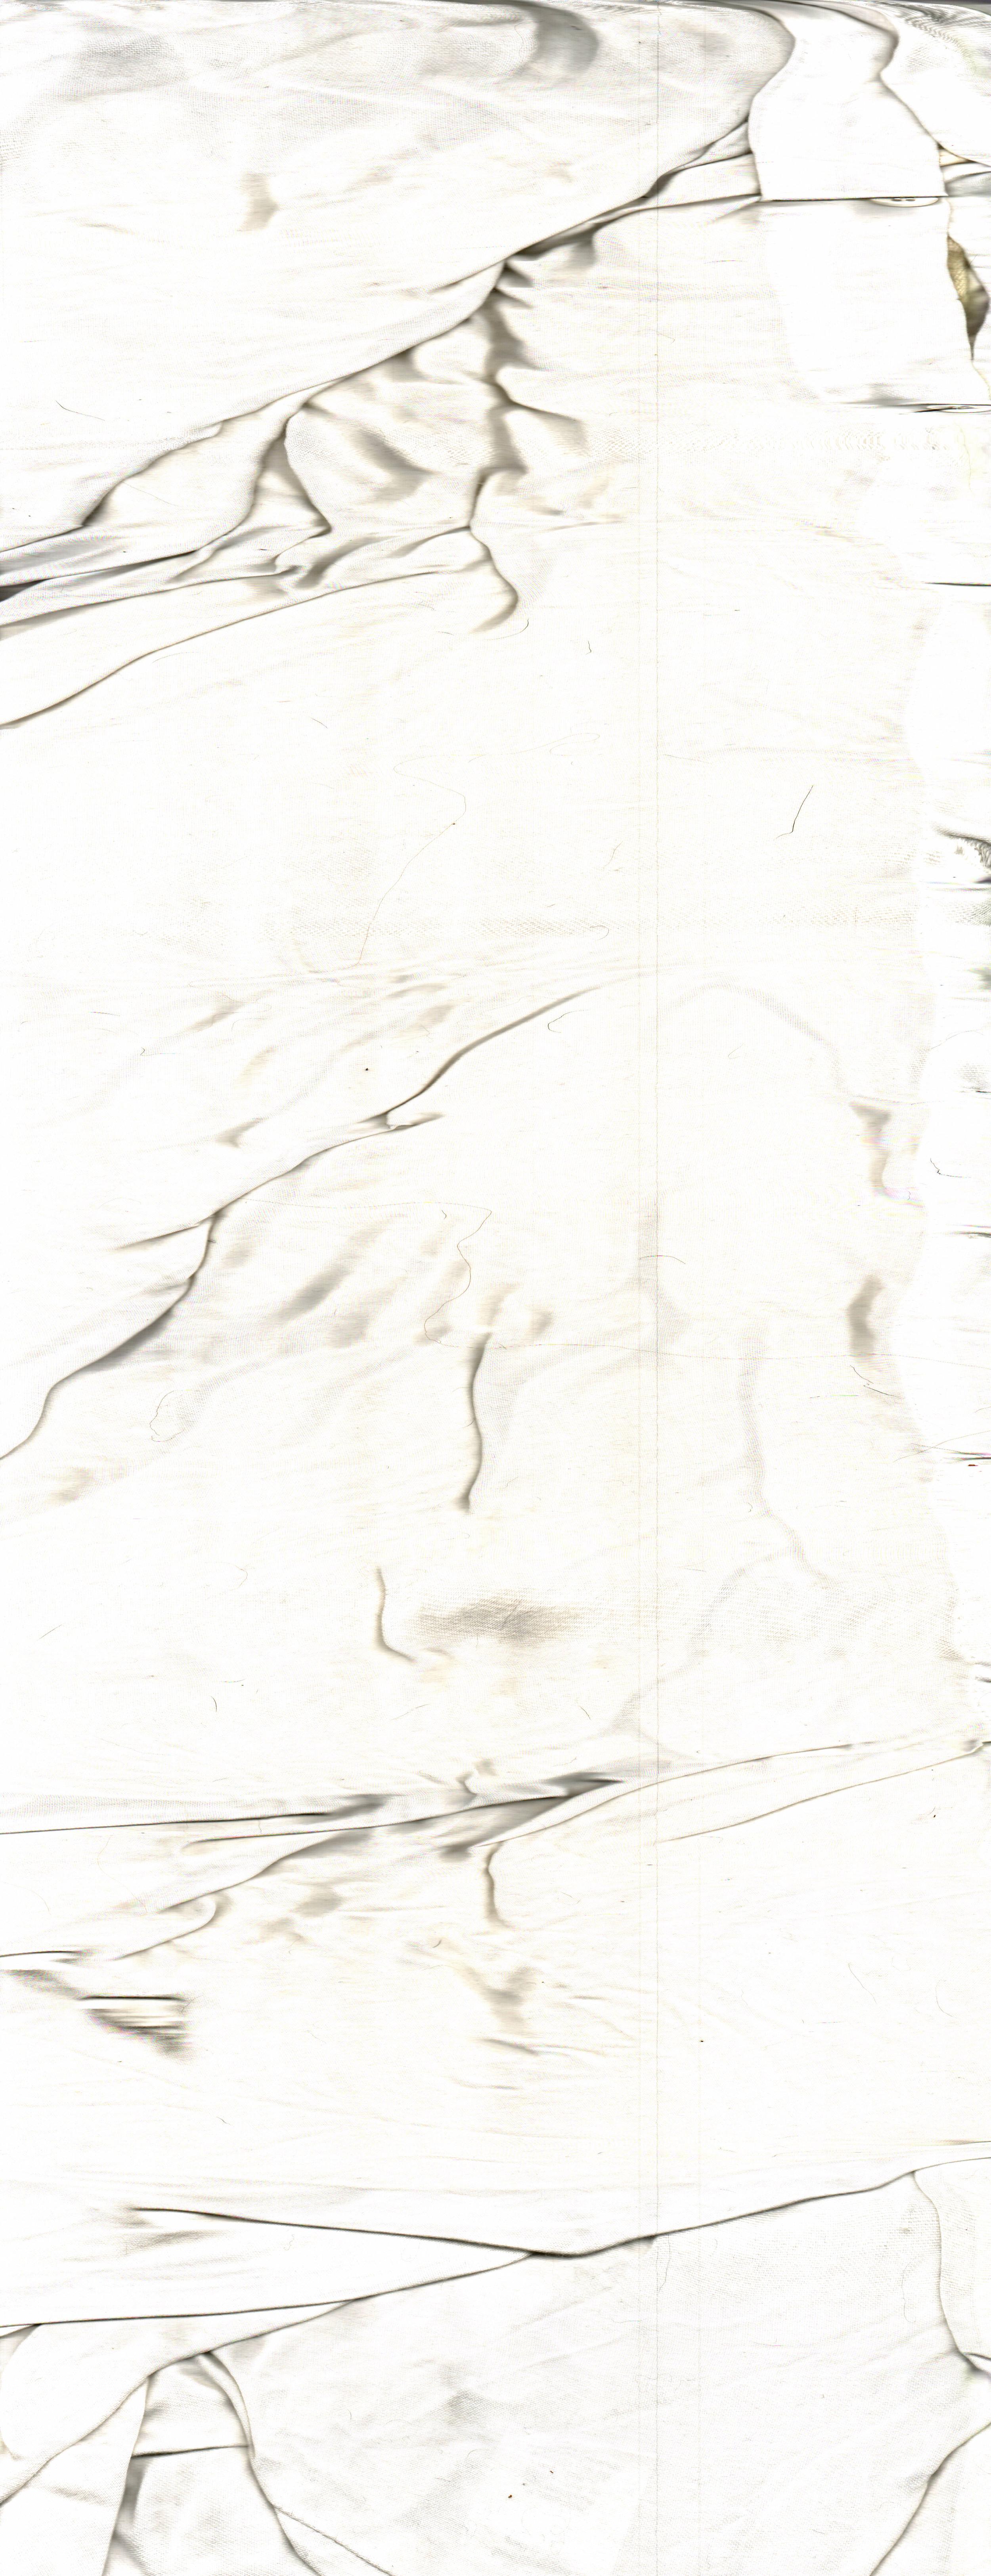 "Broke Down Frames , 2015  Archival Digital Prints, Waxed Linen Thread  32"" x 84.5"""